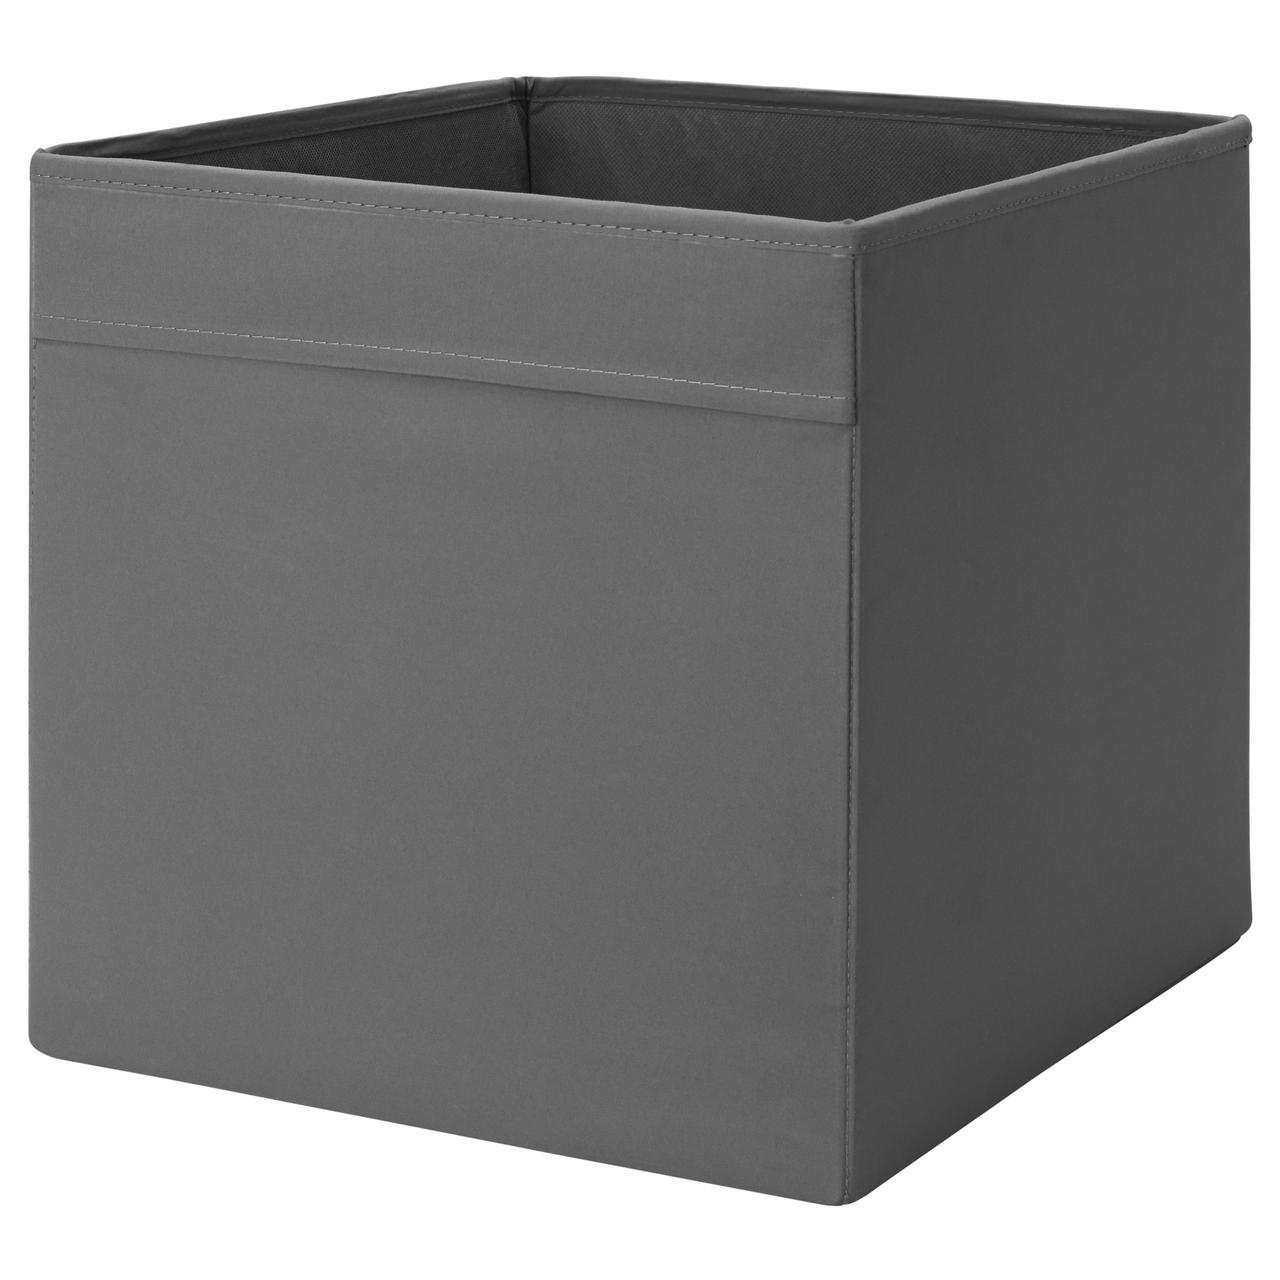 ДРОНА Ящик, темно-серый, 33x38x33 см 10443974 ИКЕА, IKEA, DRONA